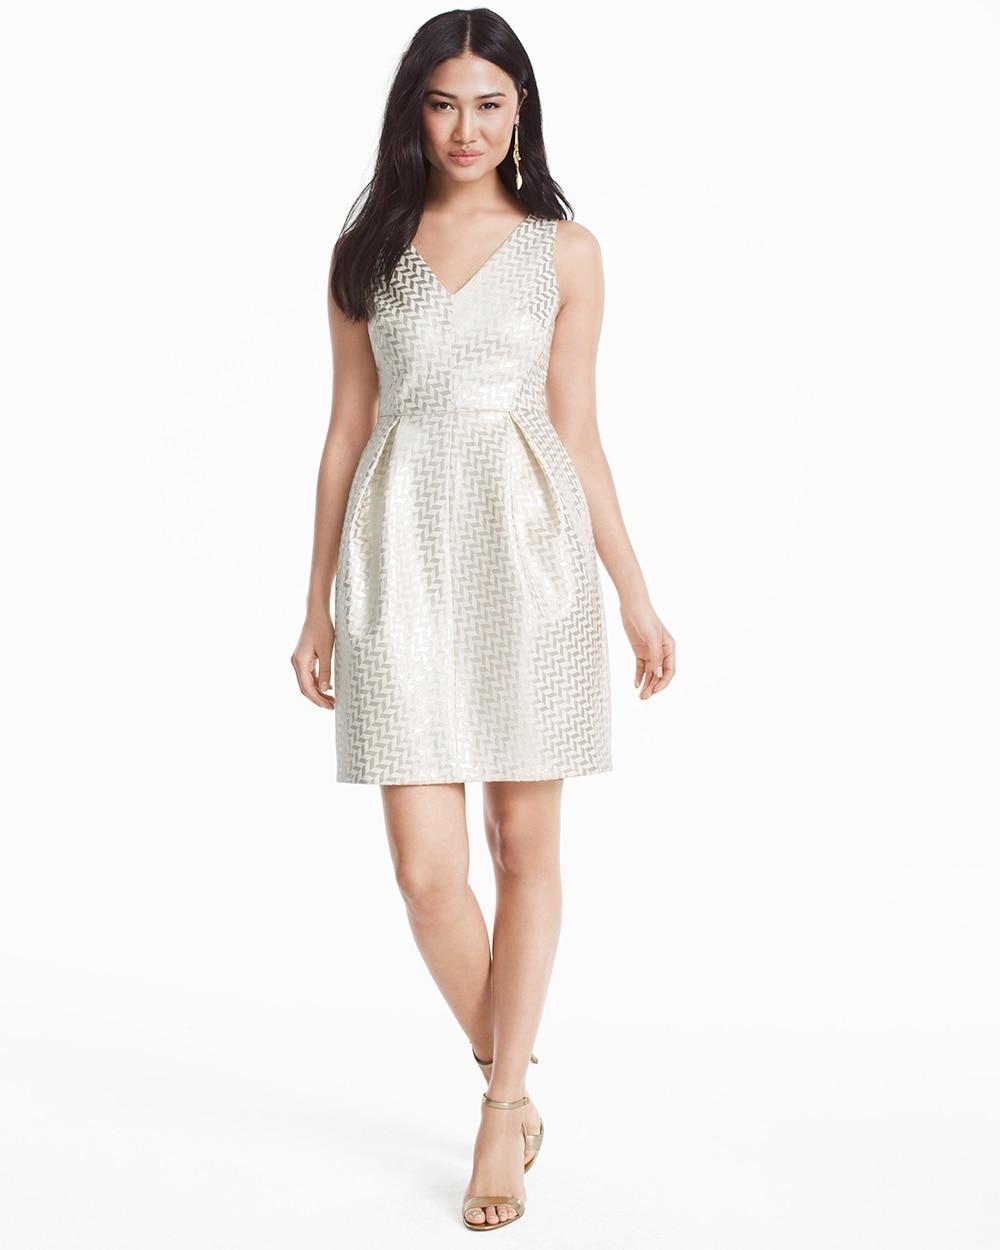 ebe27a9a00860 Gold Jacquard Geo Tulip Dress - White House Black Market